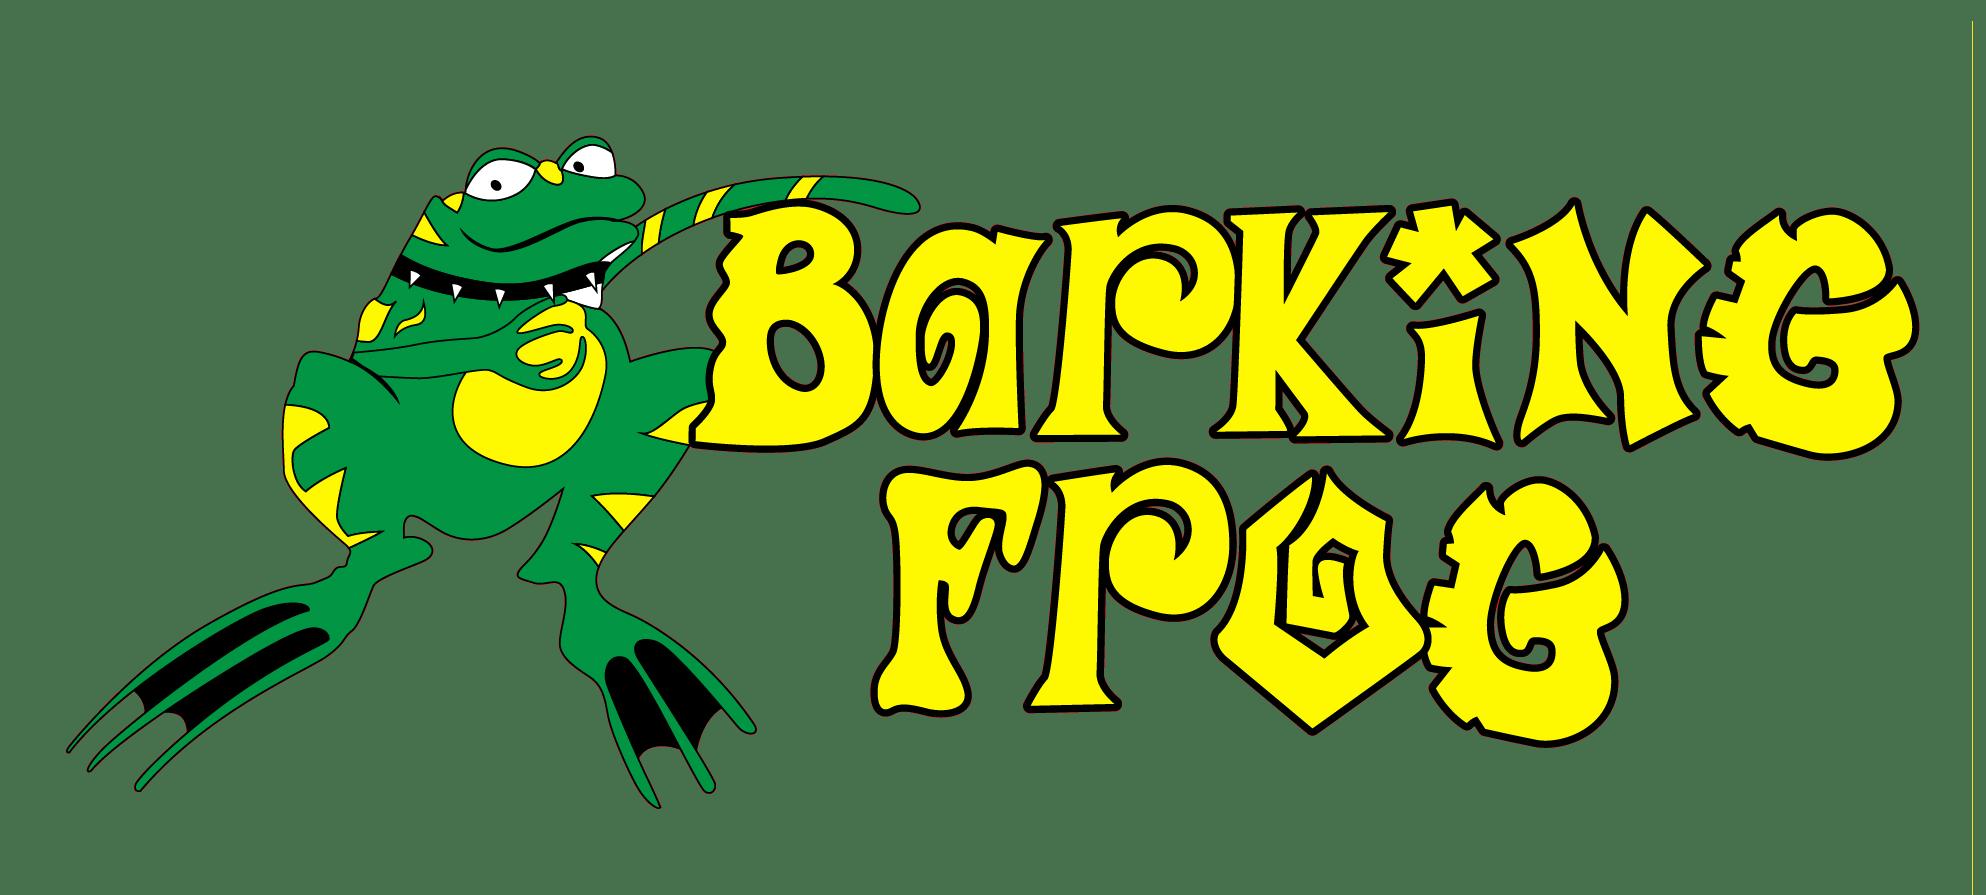 Beacon Barking Frog Logo